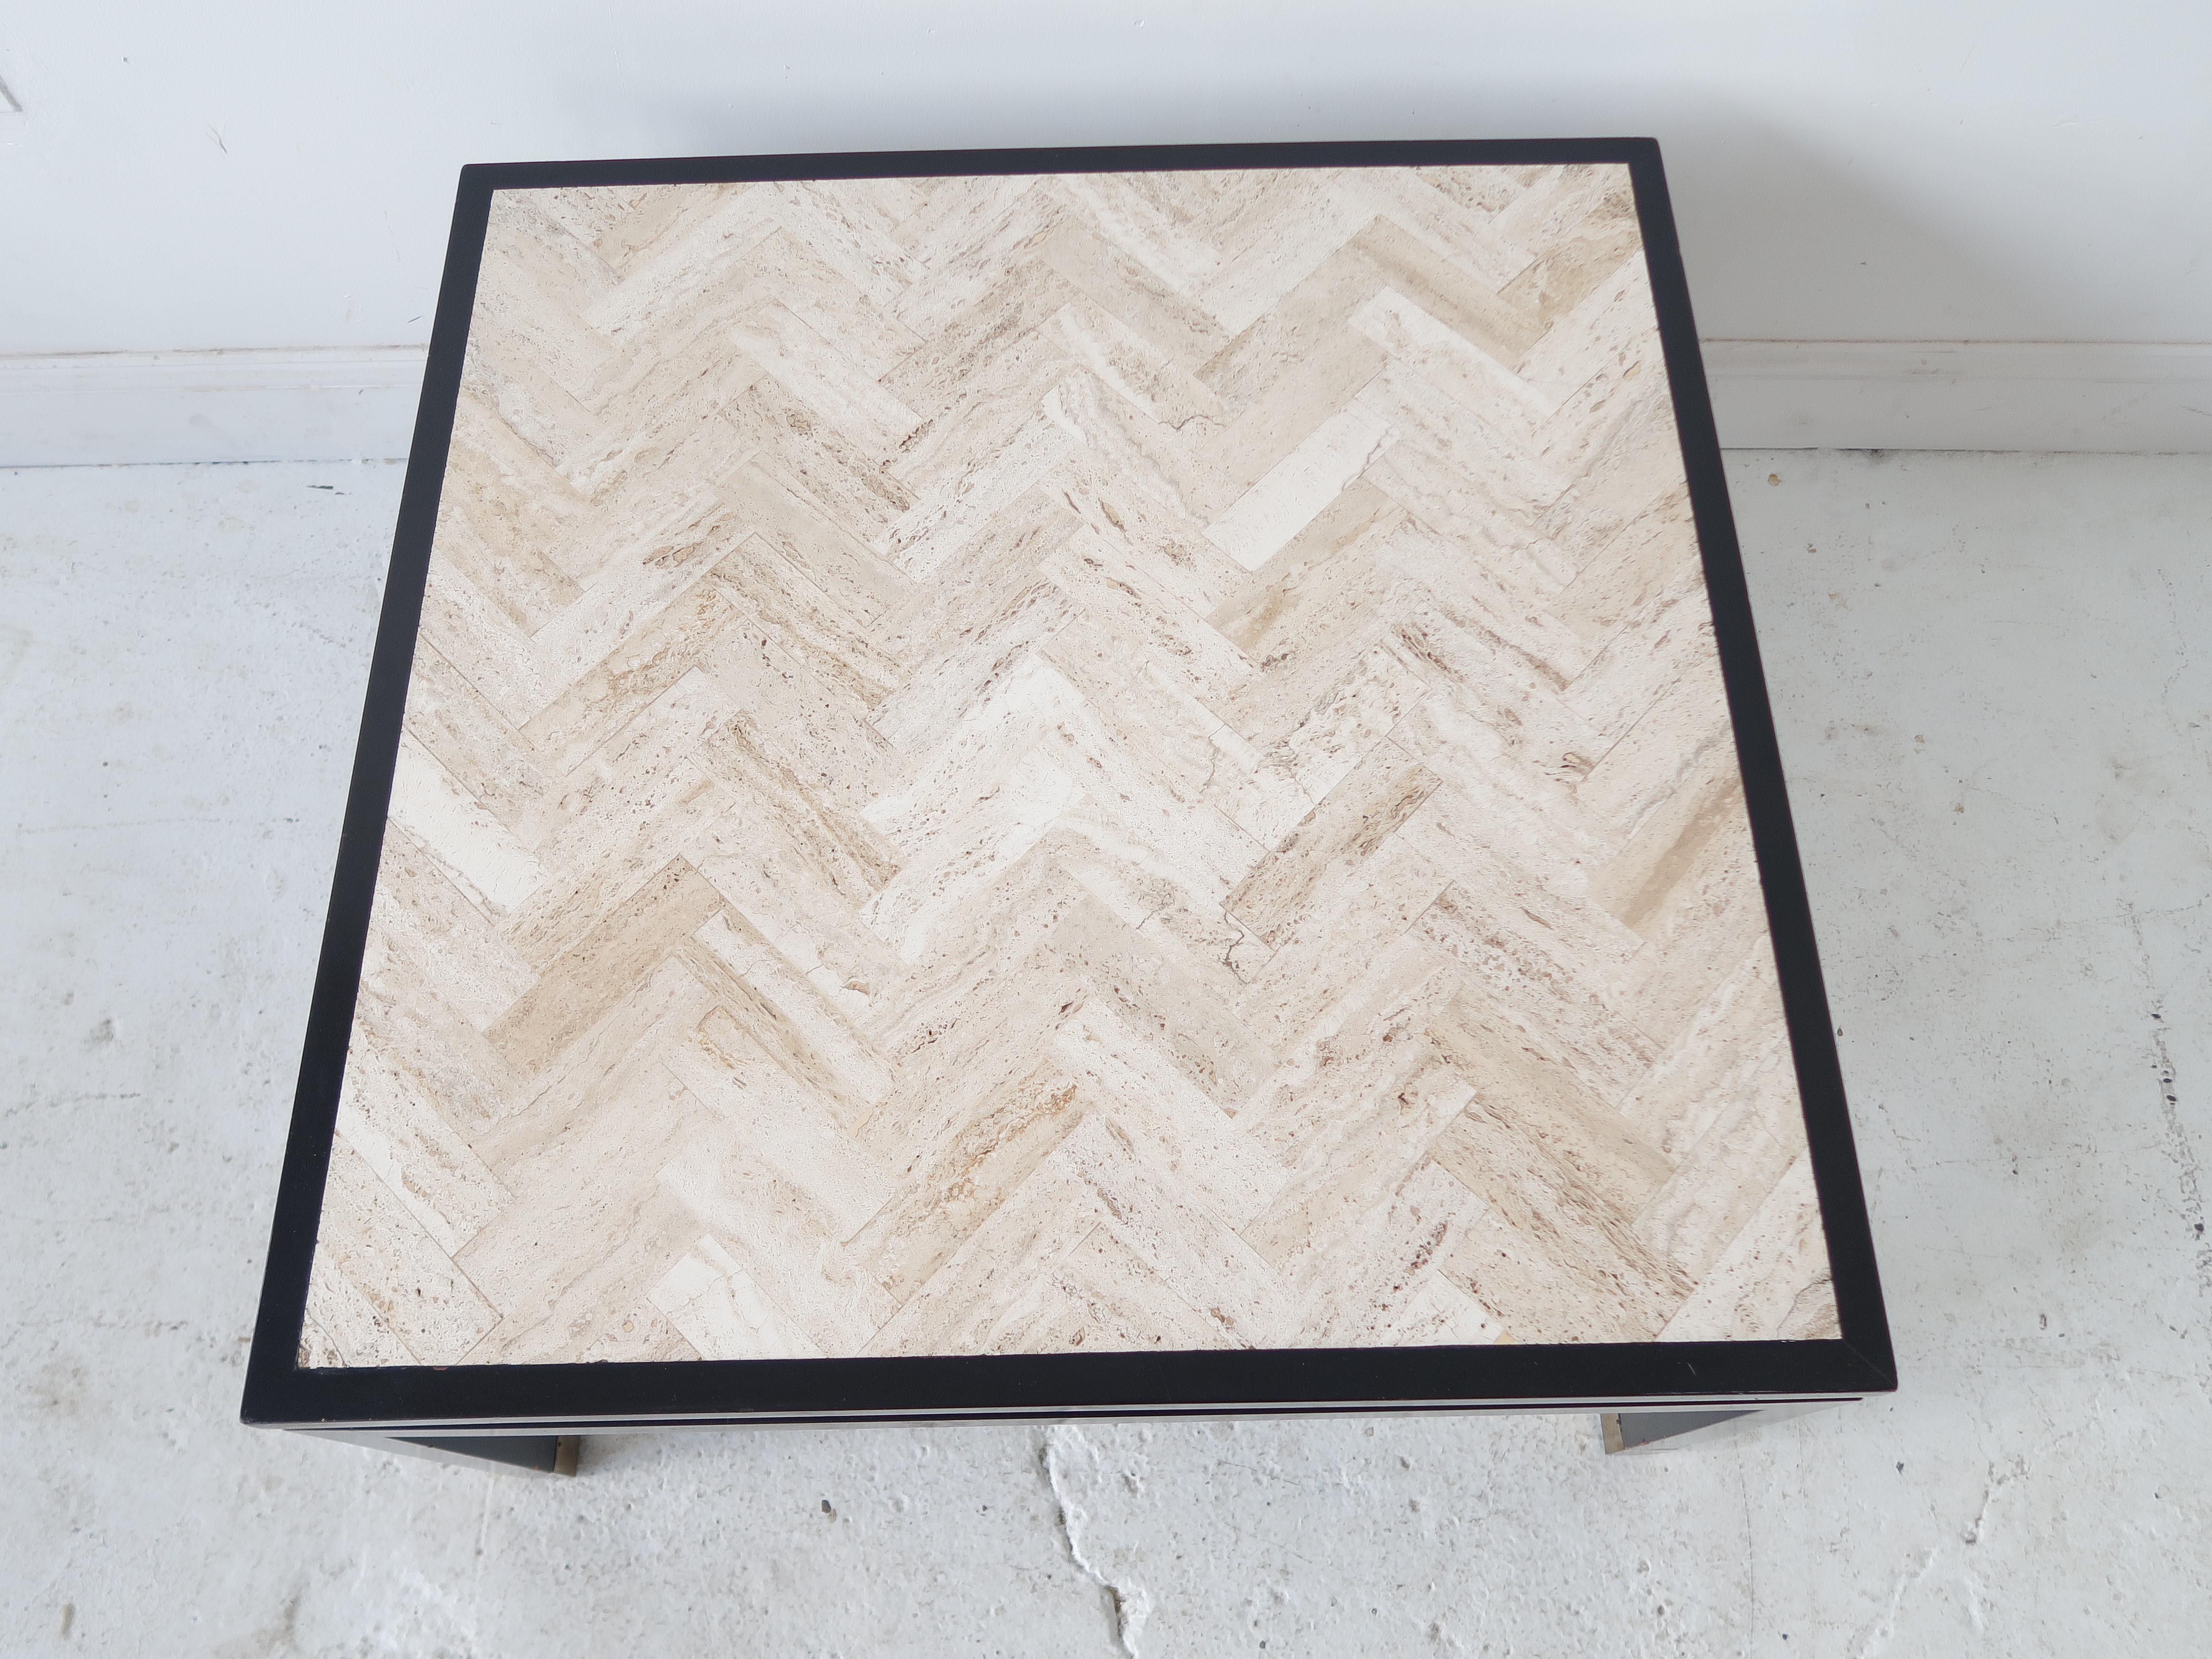 Square White Travertine Coffee Table With Herringbone Design